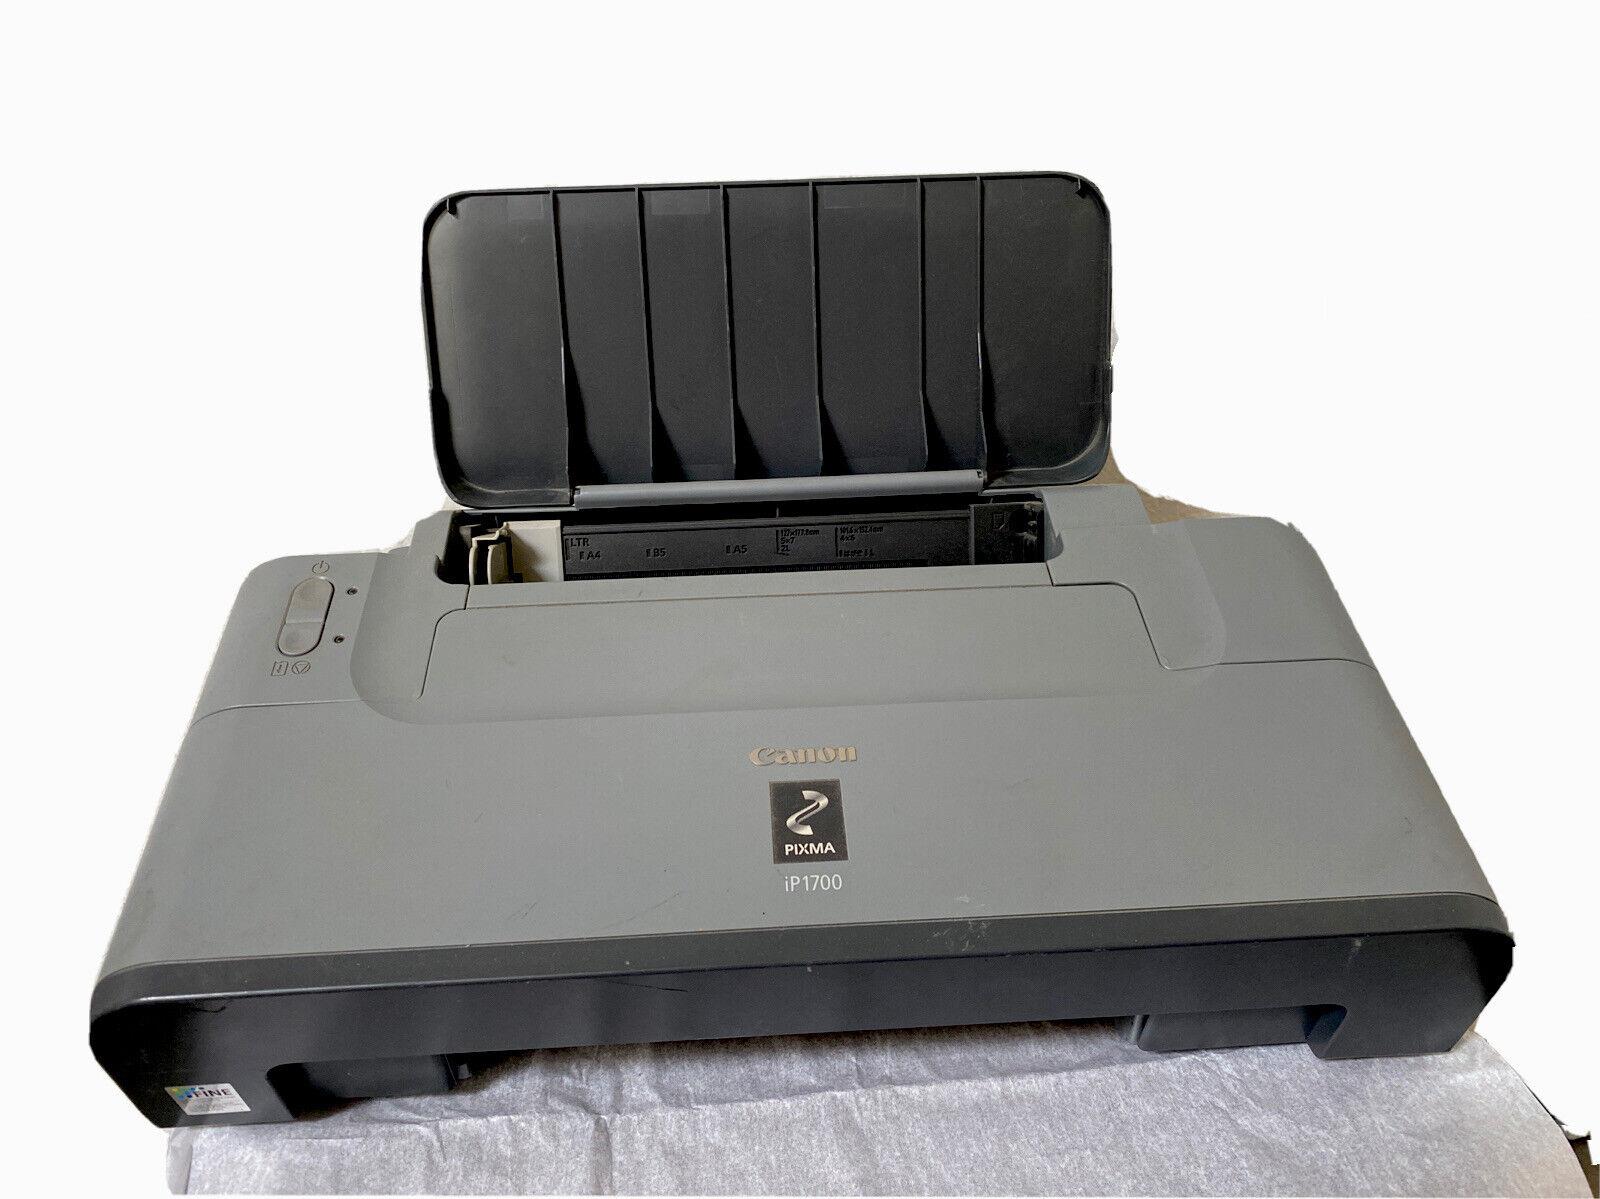 Gray Canon PIXMA iP1700 Photo Inkjet Printer